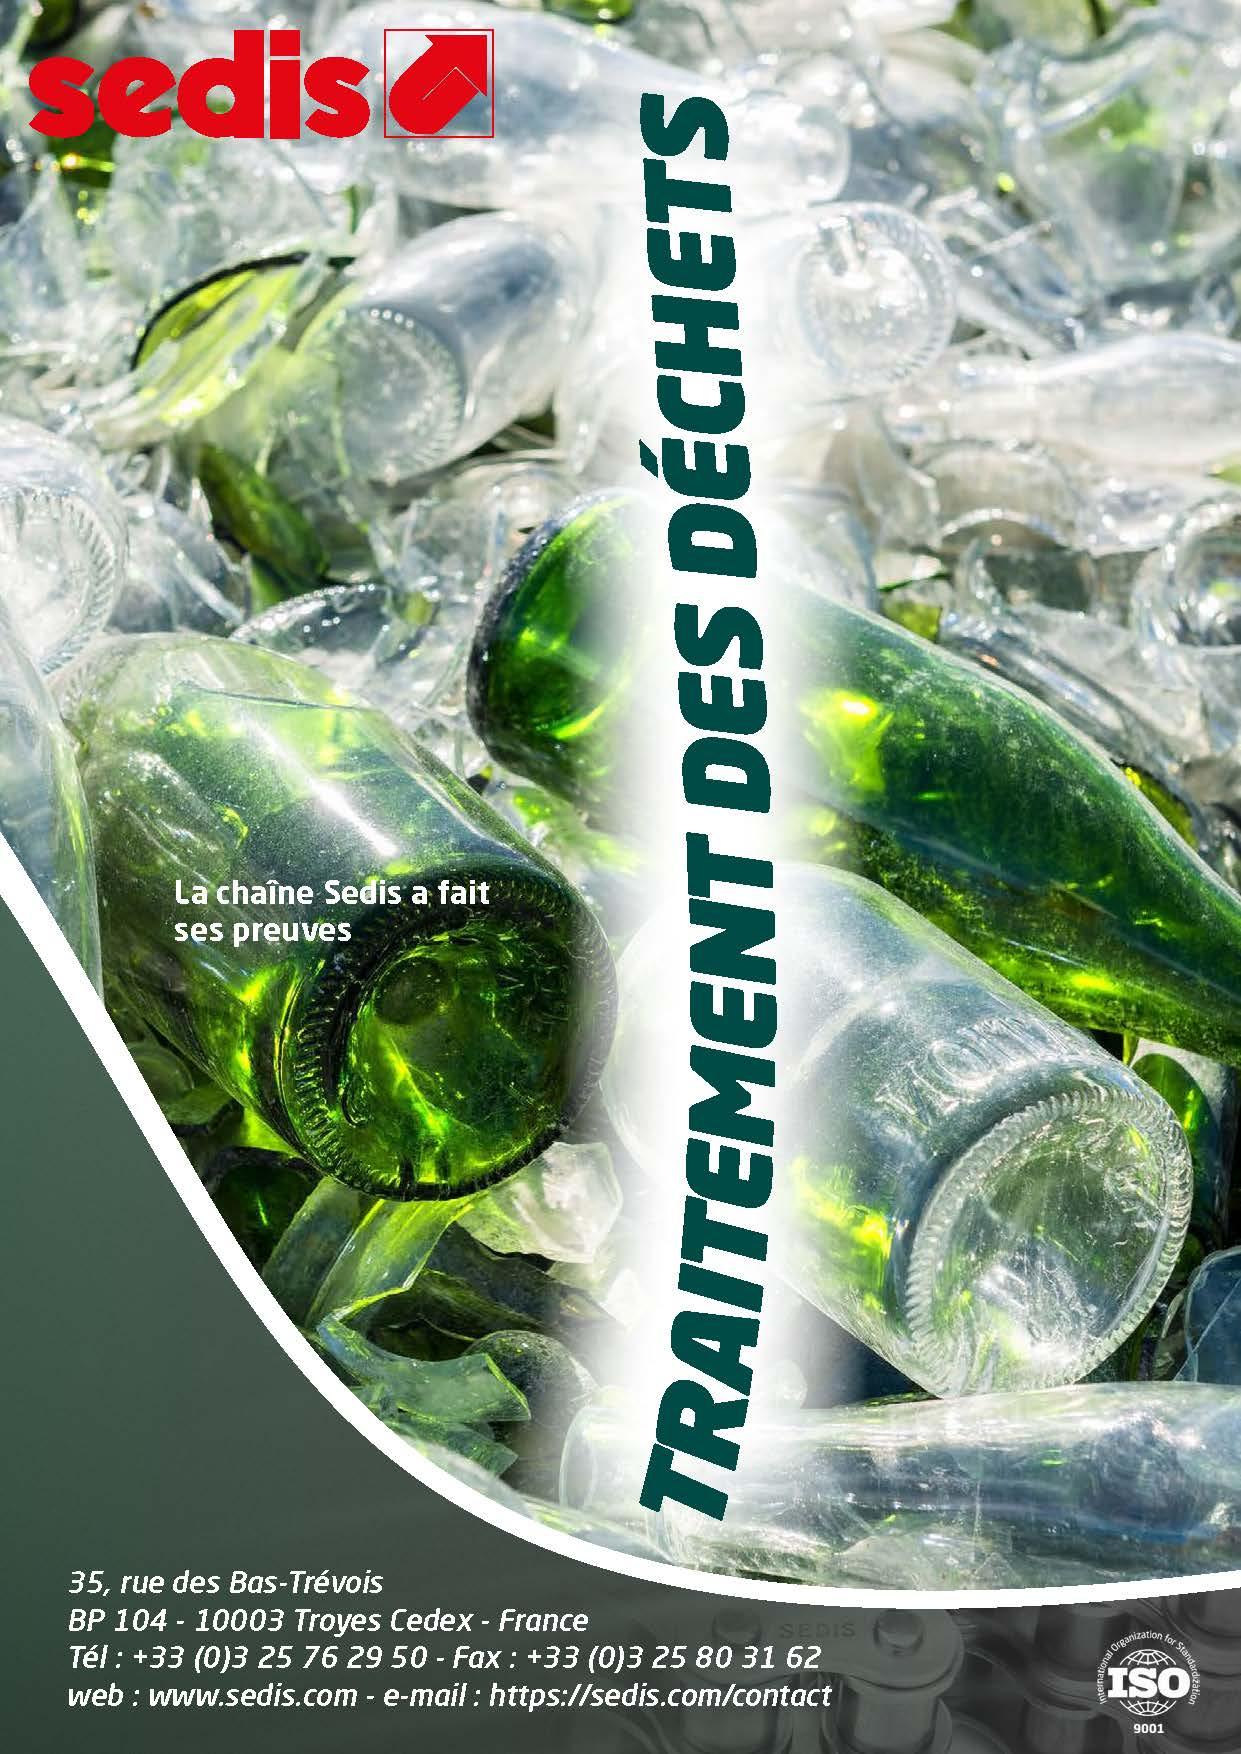 sedis brochure metier traitement des dechets